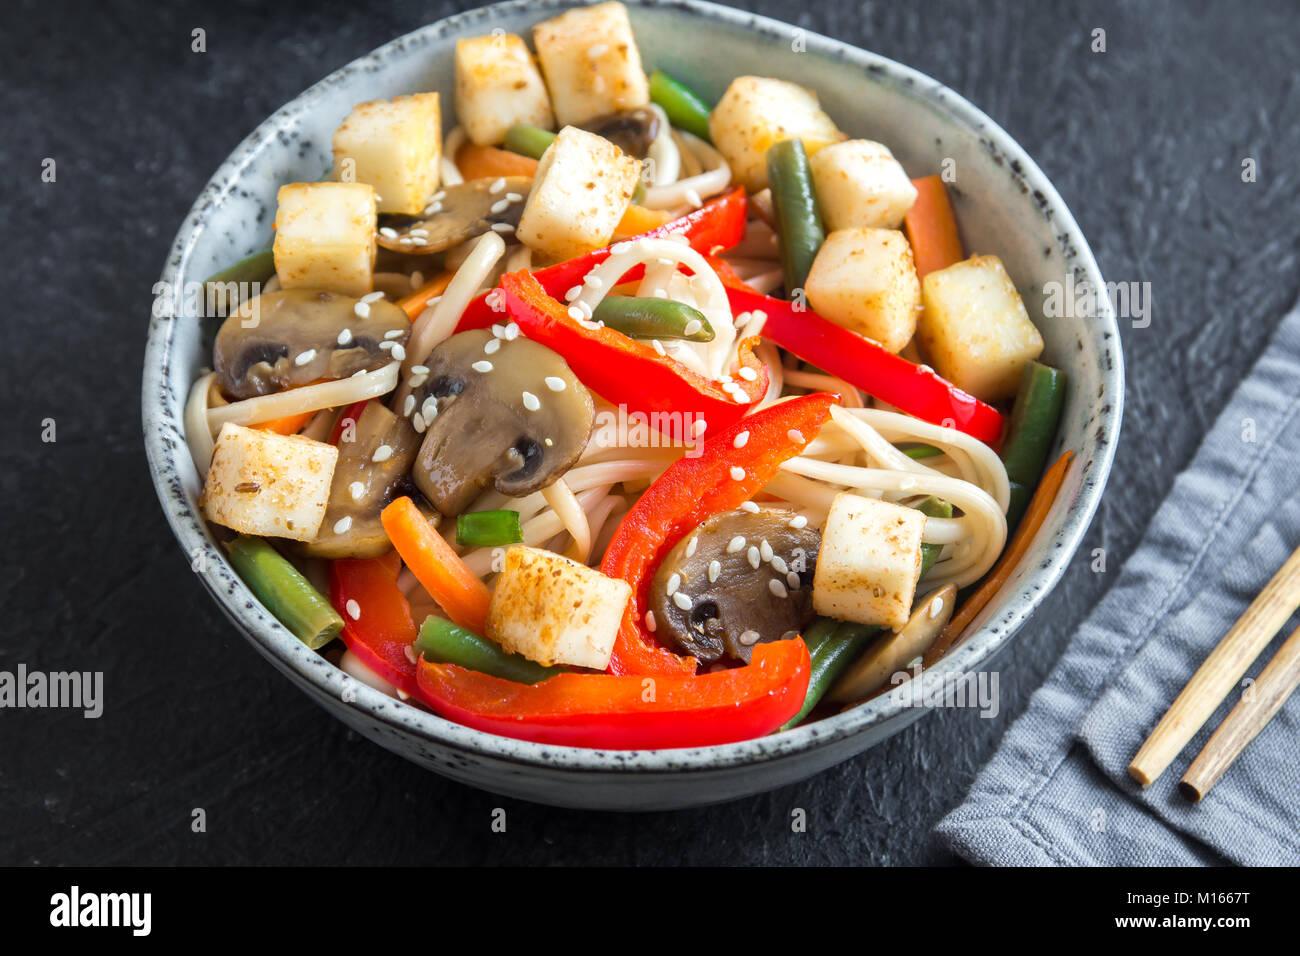 Stir fry with udon noodles, tofu, mushrooms and vegetables. Asian vegan vegetarian food, meal, stir fry over black Stock Photo